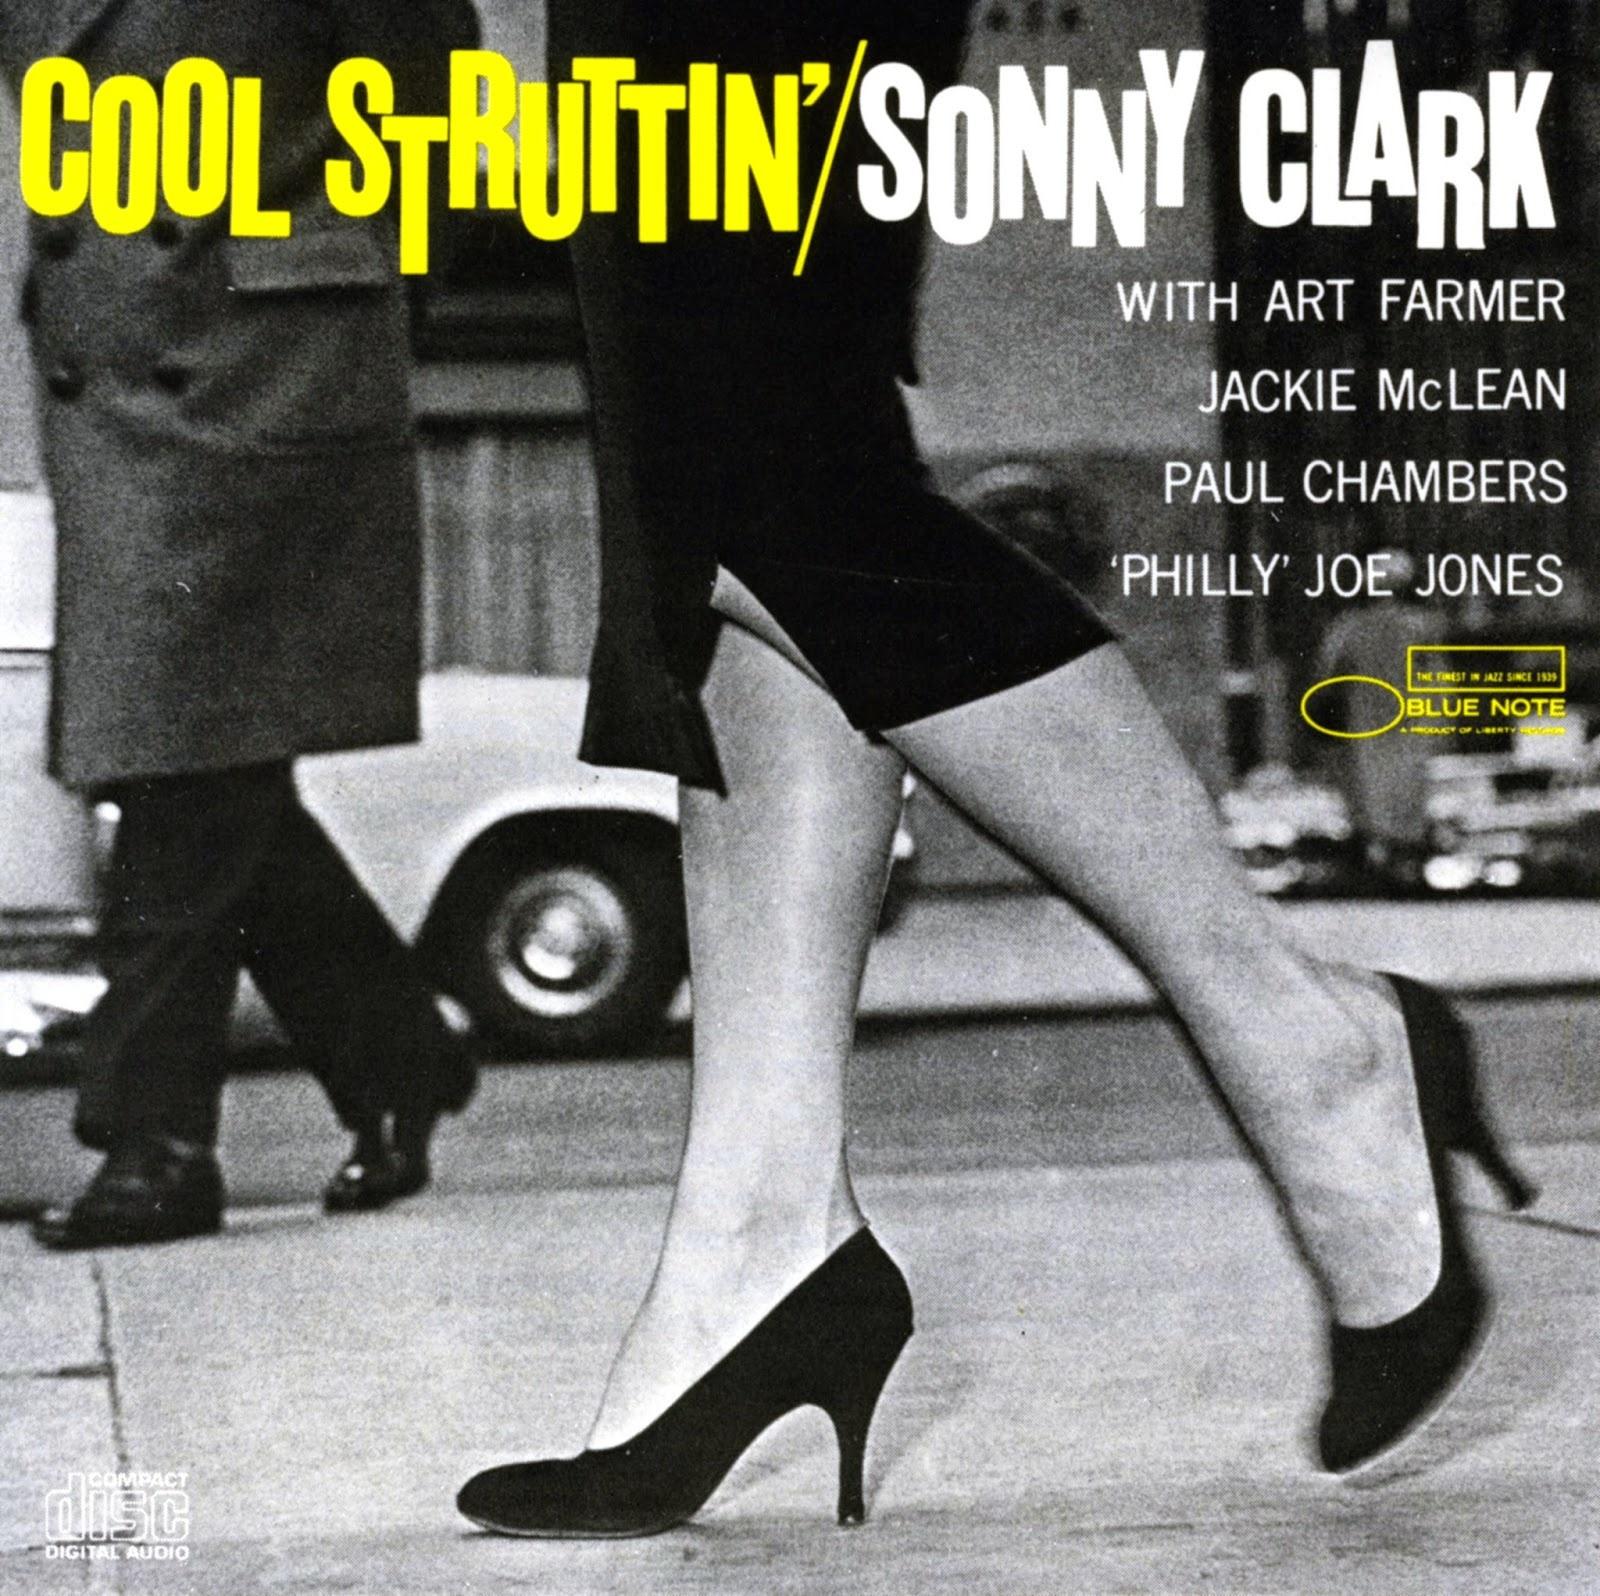 Sonny Clark • Cool Struttin'-1